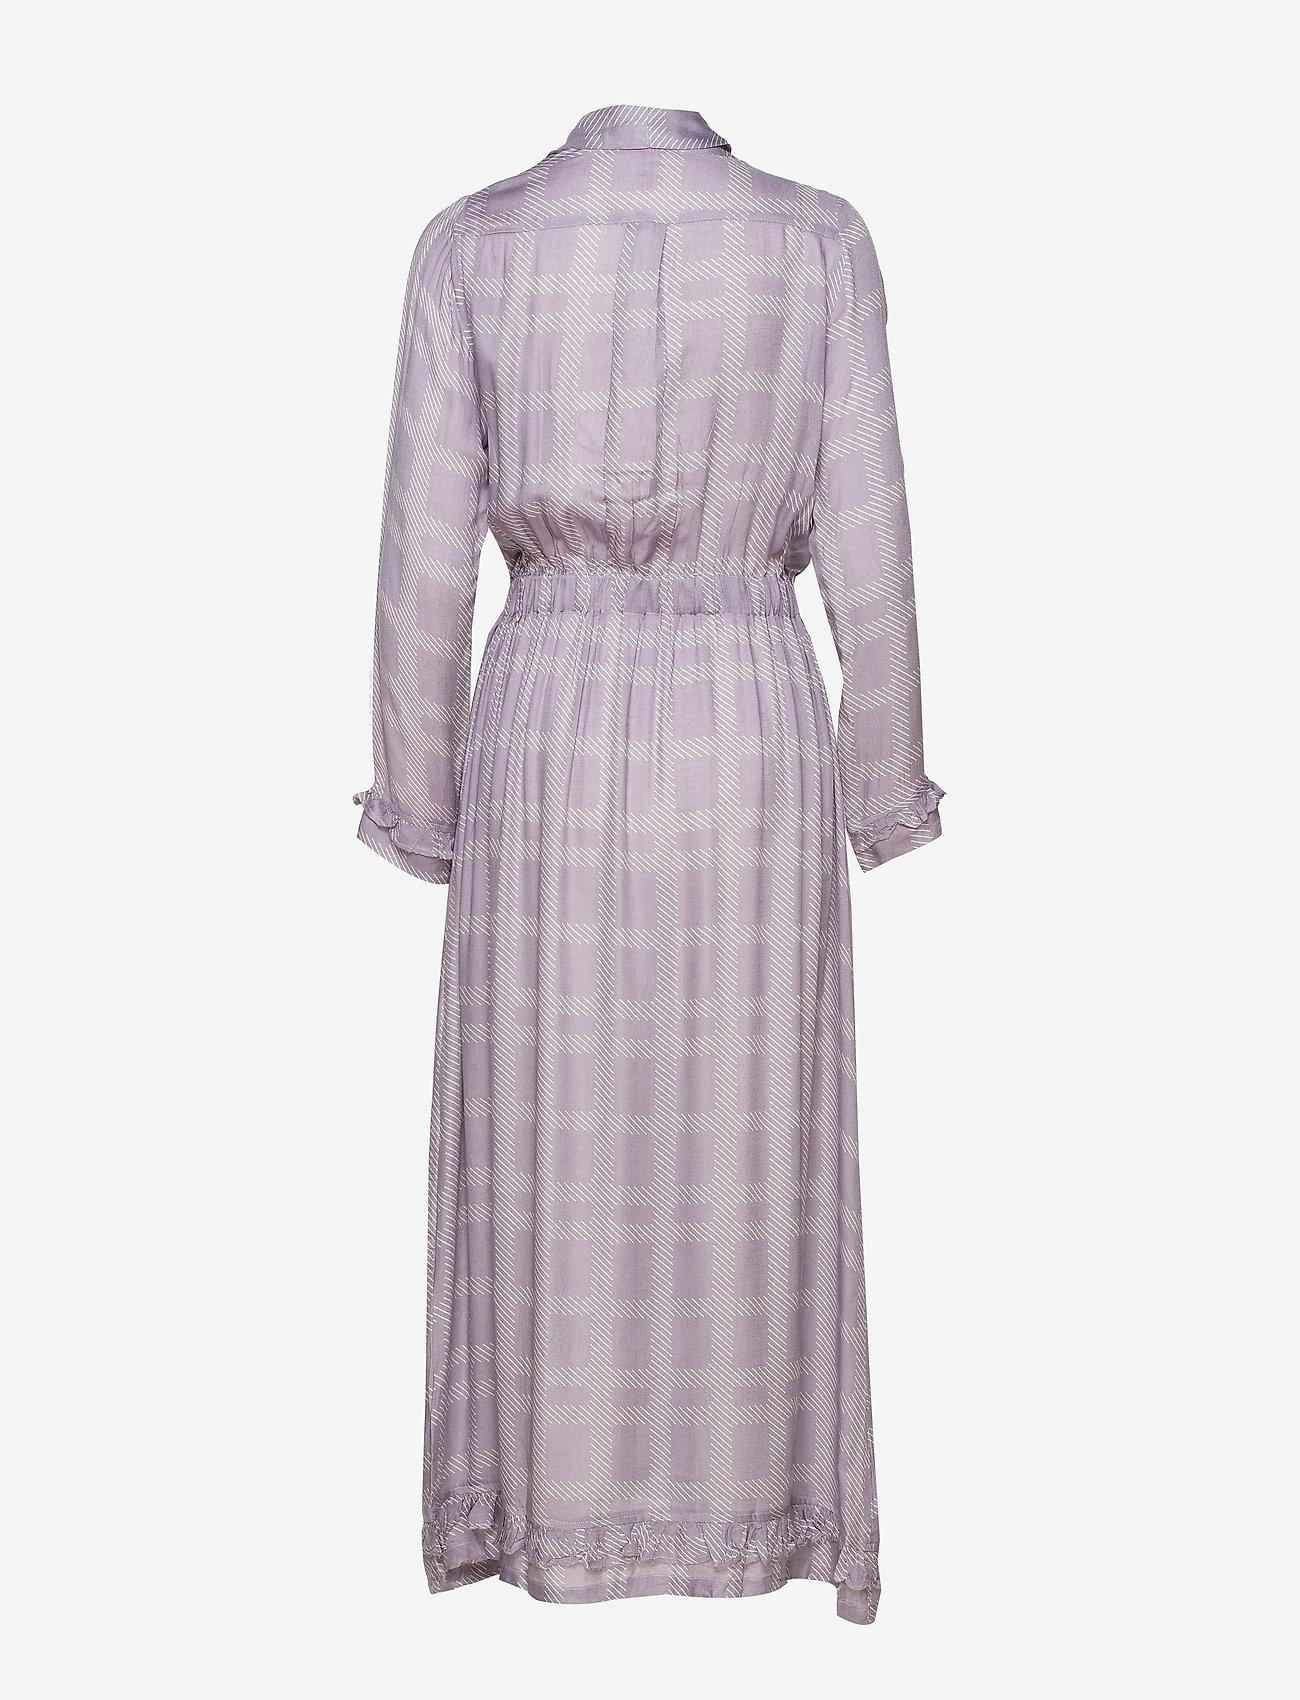 Underprotection - Terry robe - bathrobes - purple - 1